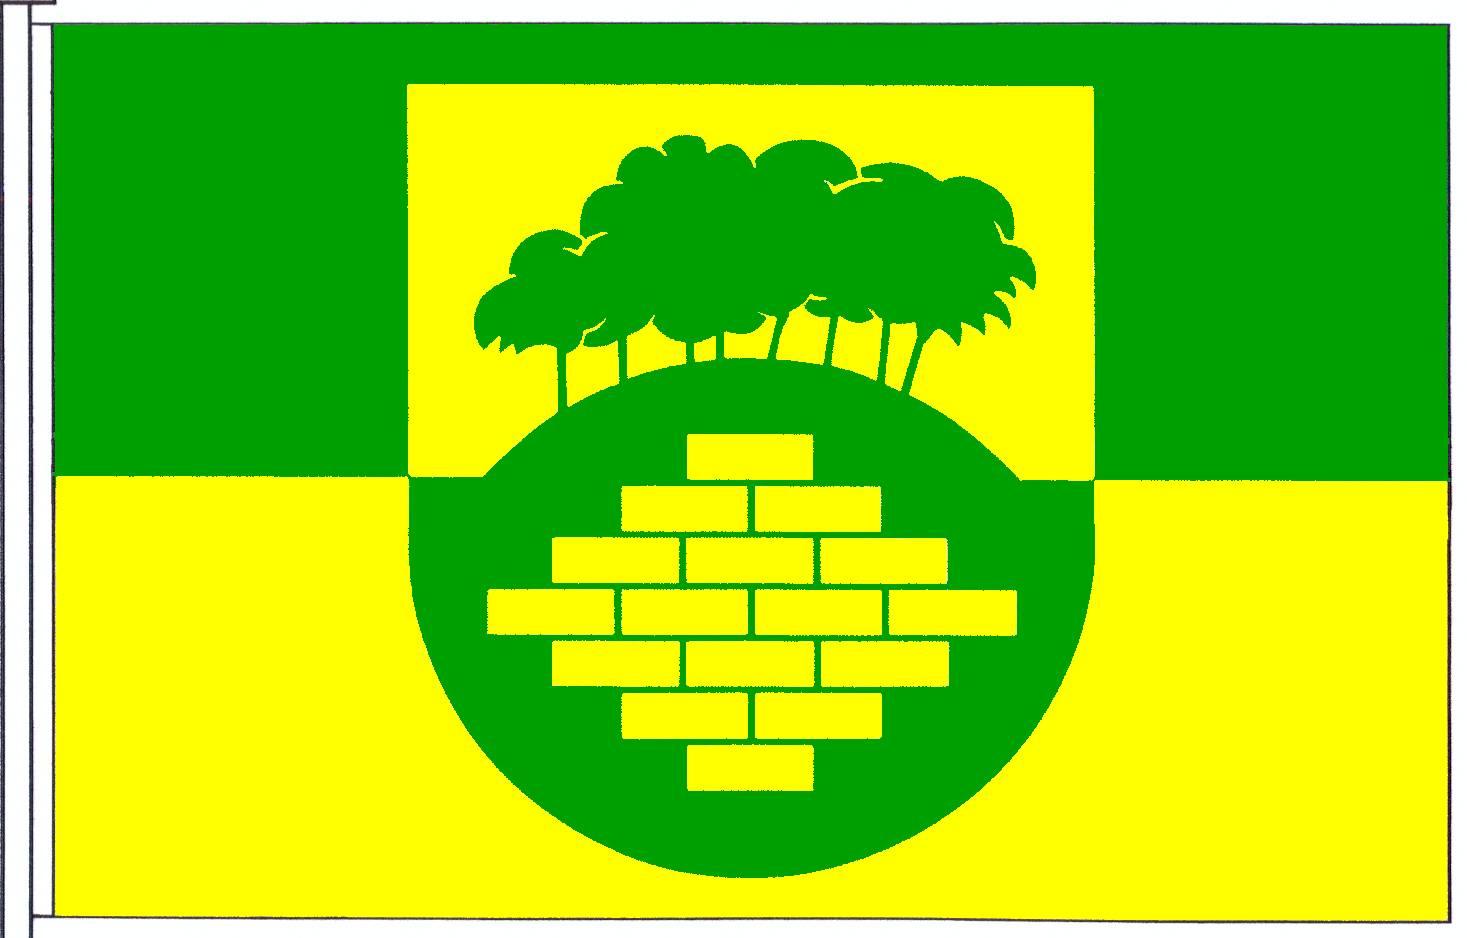 Flagge GemeindeWarringholz, Kreis Steinburg